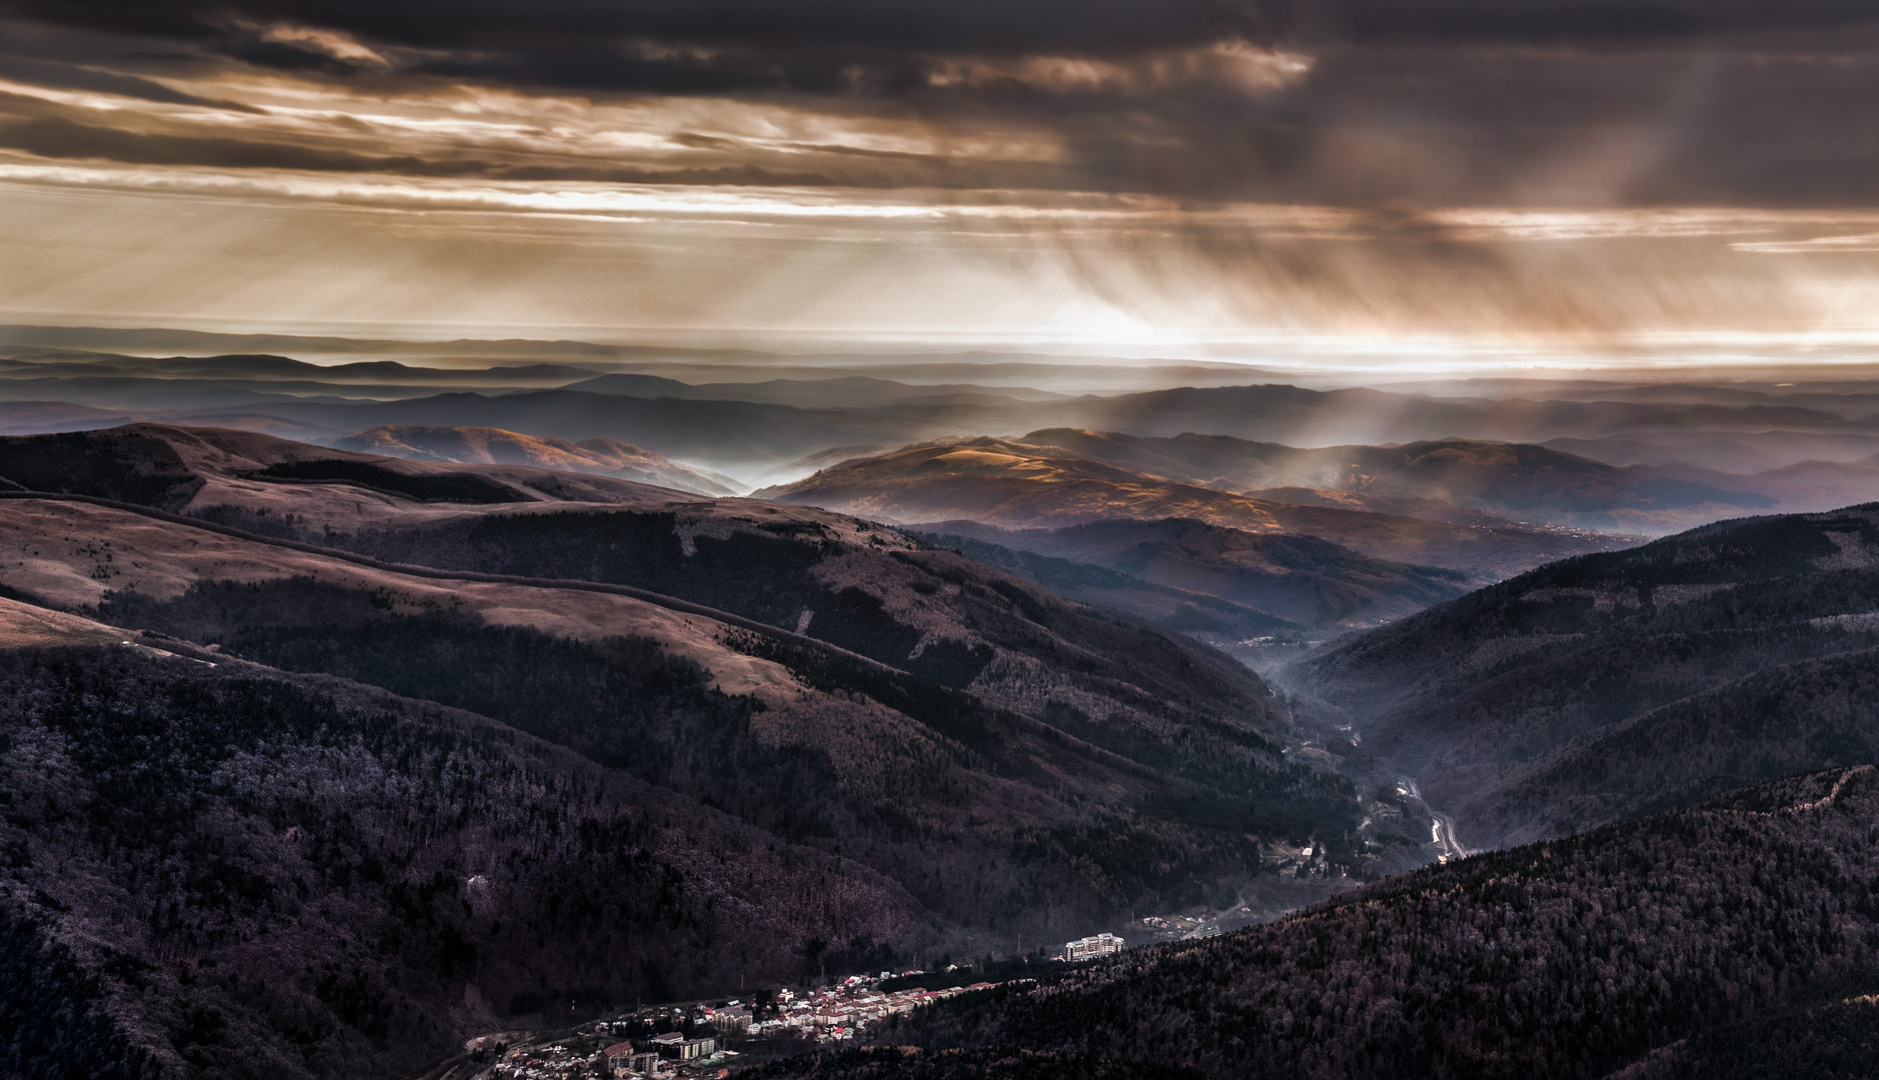 The Prahova Valley